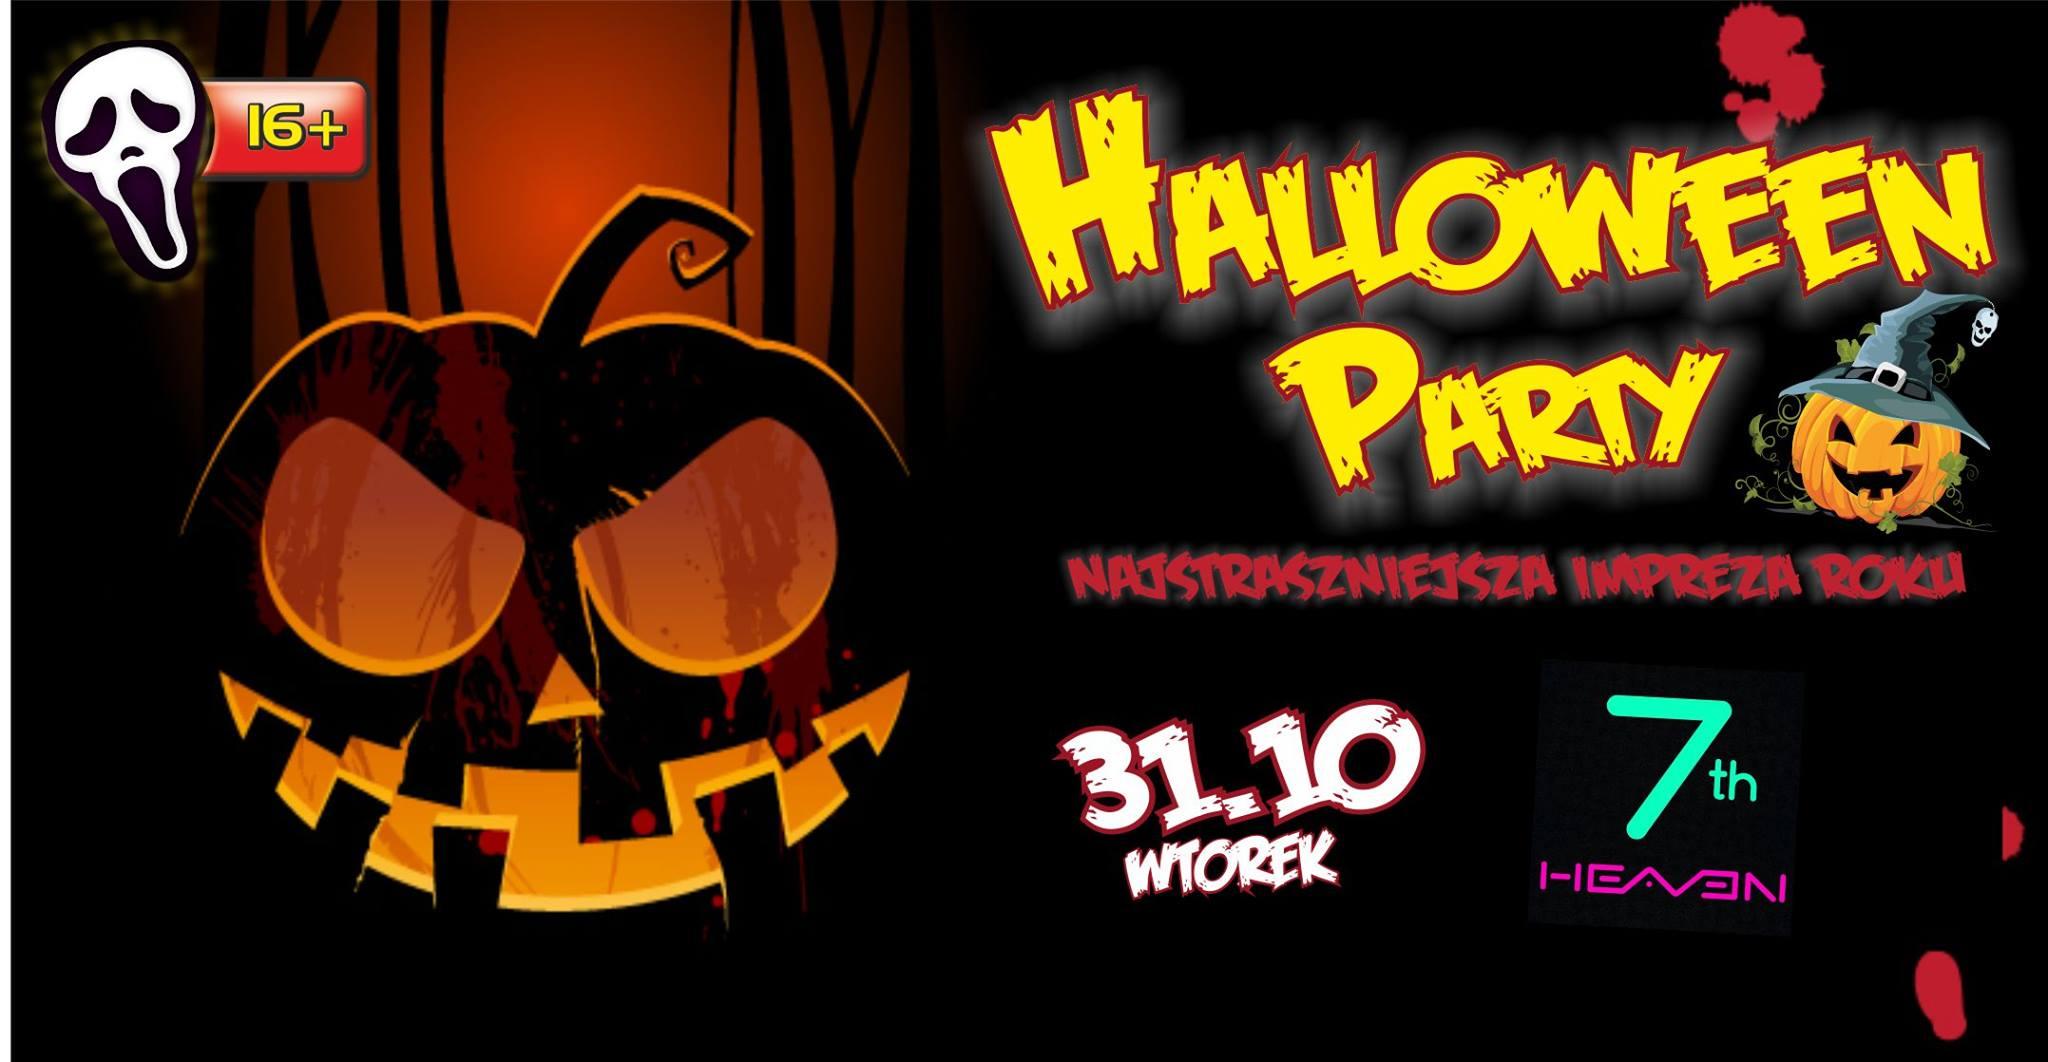 Halloween Party – Noc Zalanych Trupów / 31.10 / Seven Heaven 16+